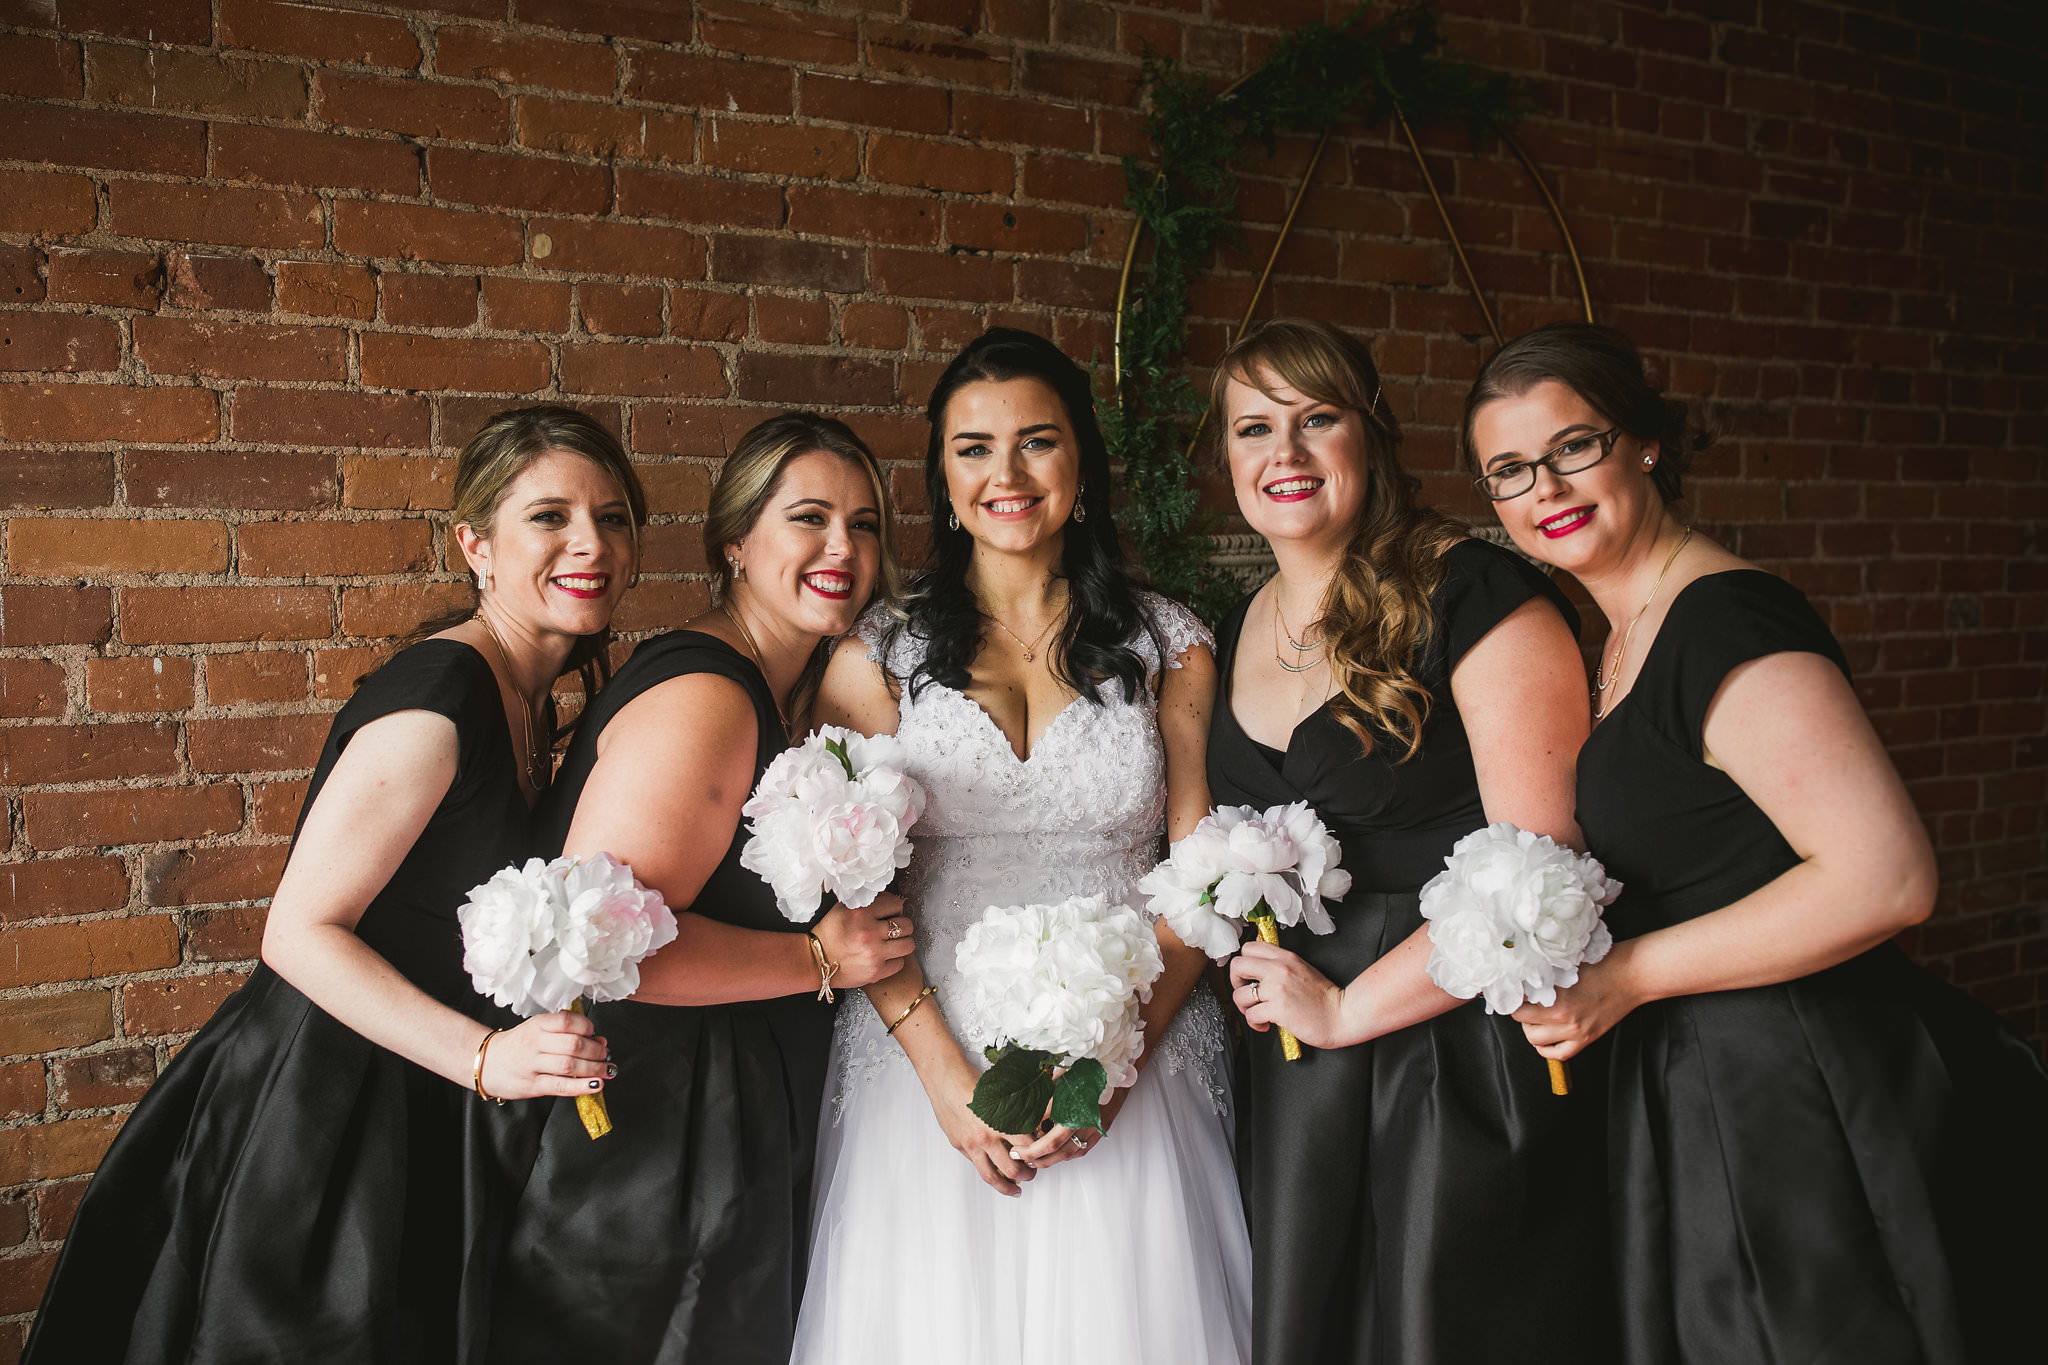 Kristen Adam Kindred Loft Whitby Wedding Photos 218 - Durham Wedding Photographer: Kindred Loft Wedding Photos